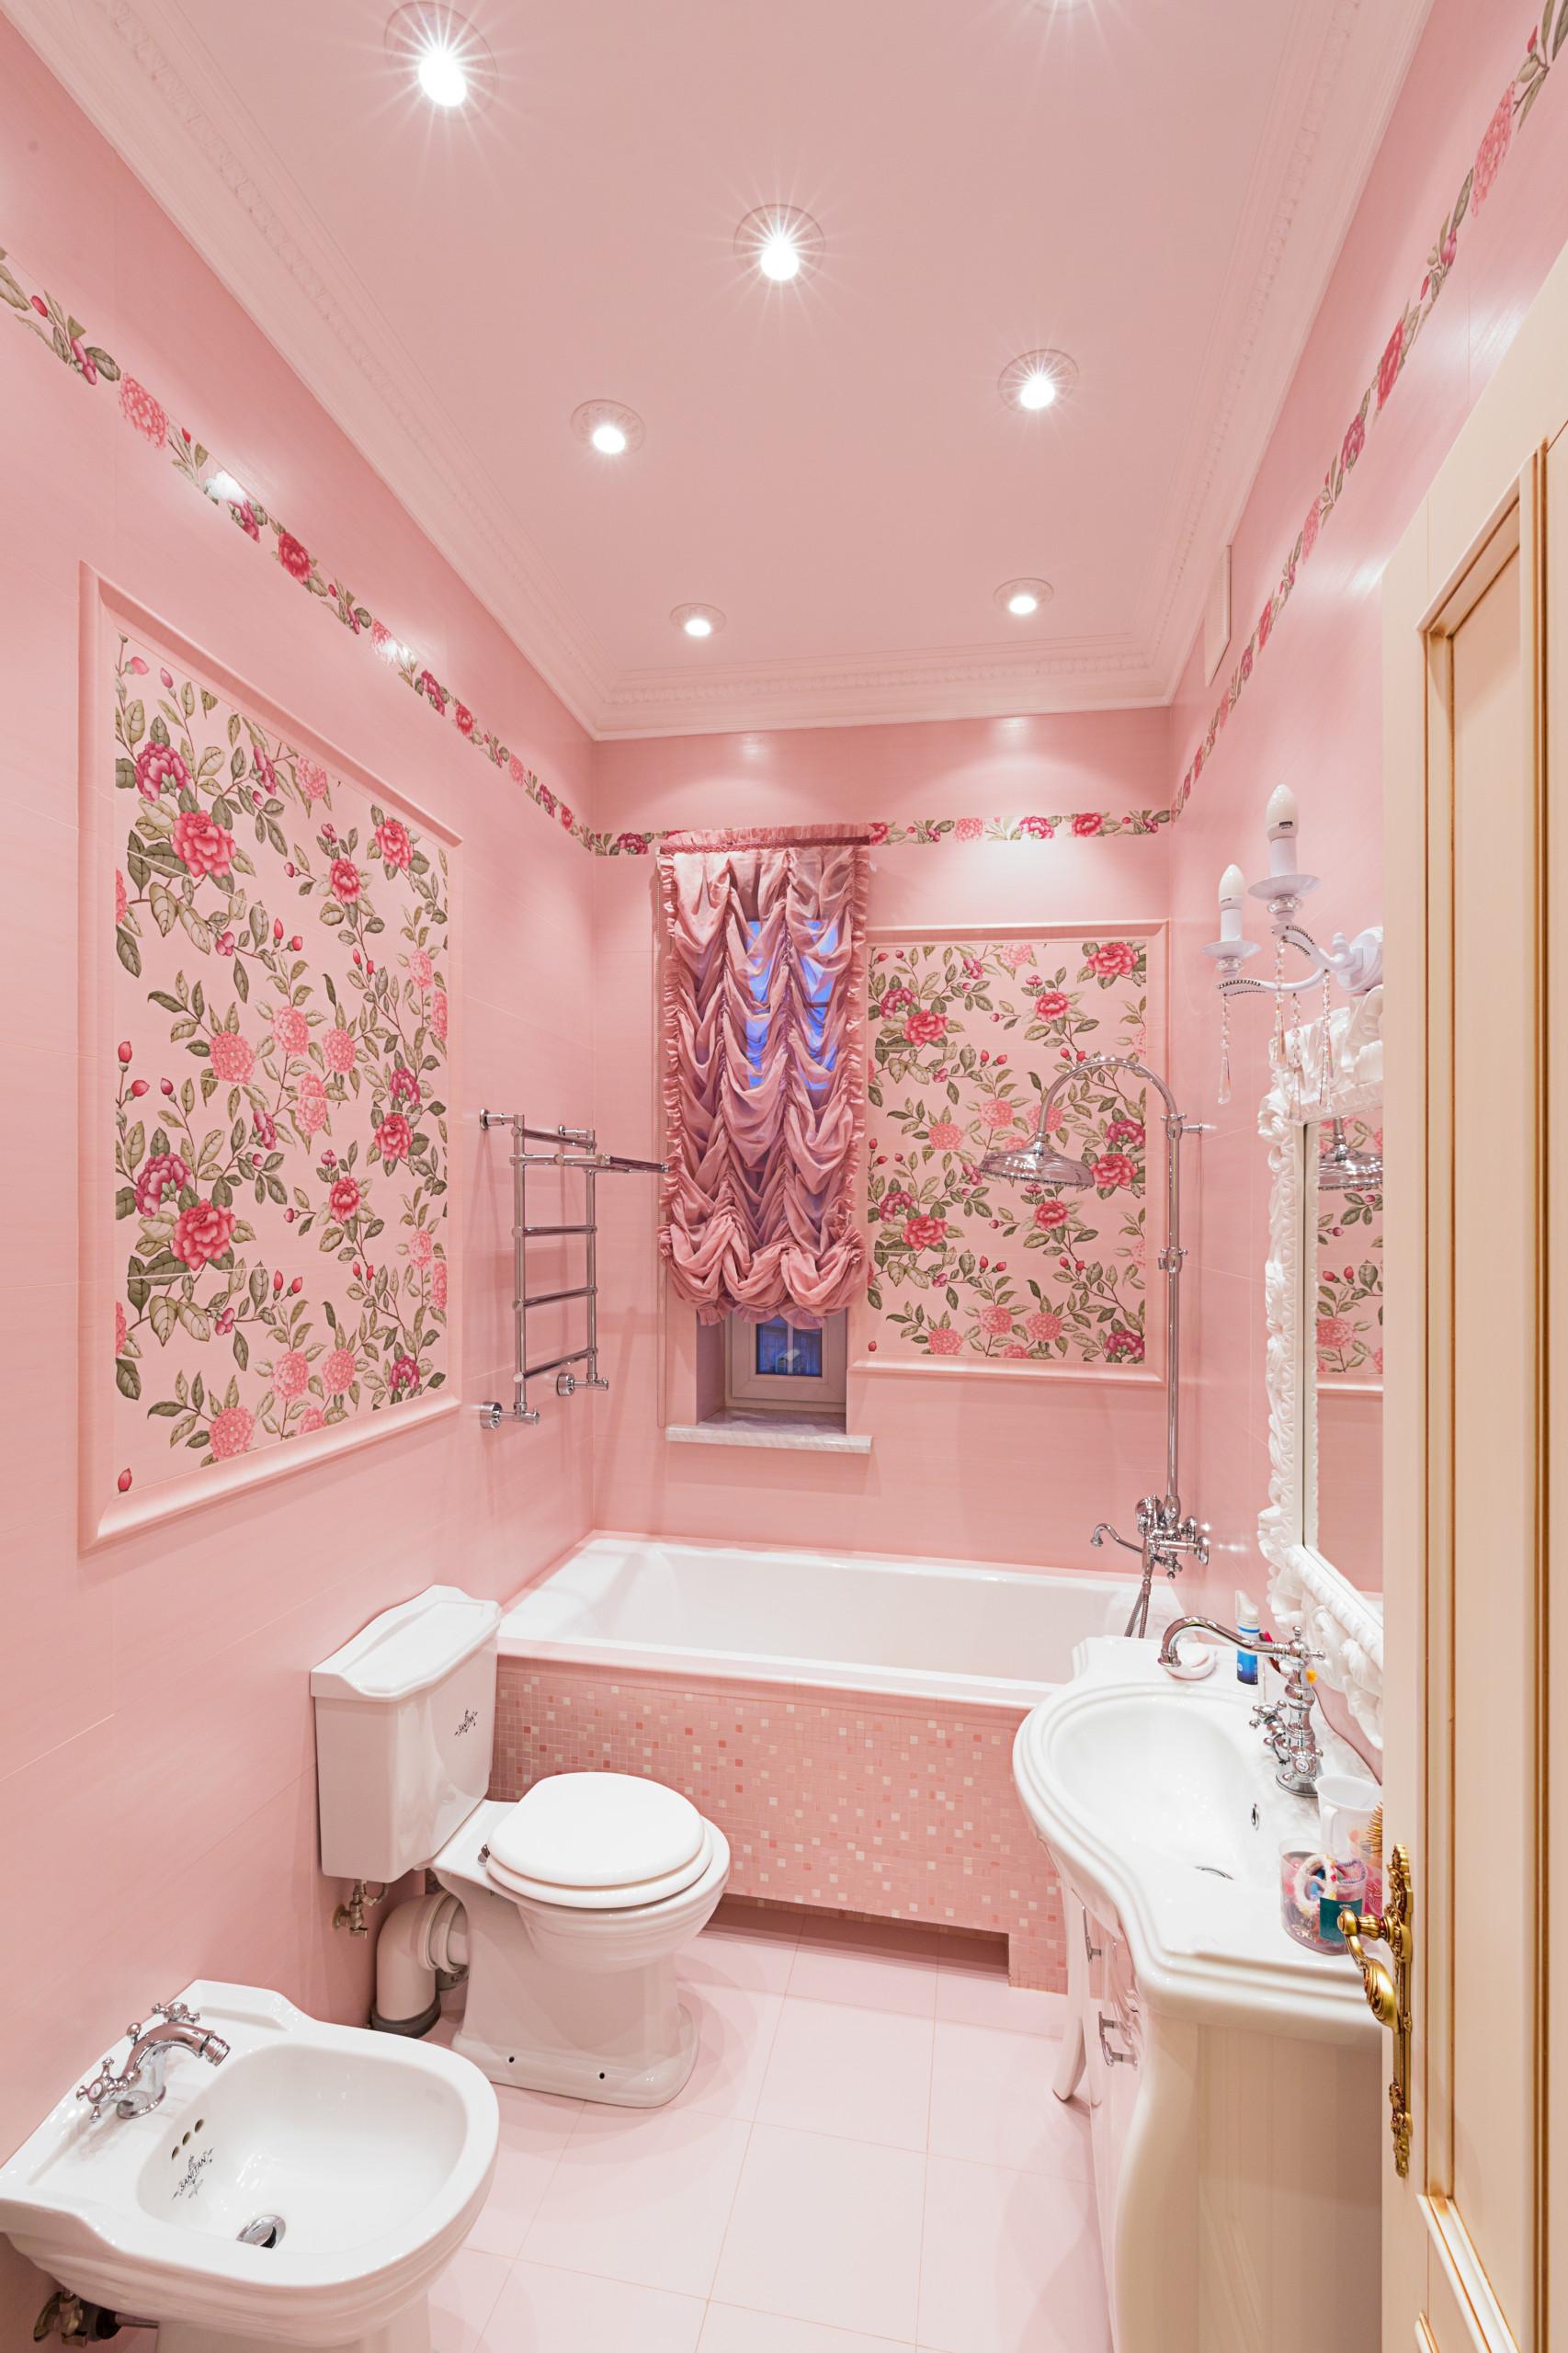 Розовая ванная комната с узорами на стенах